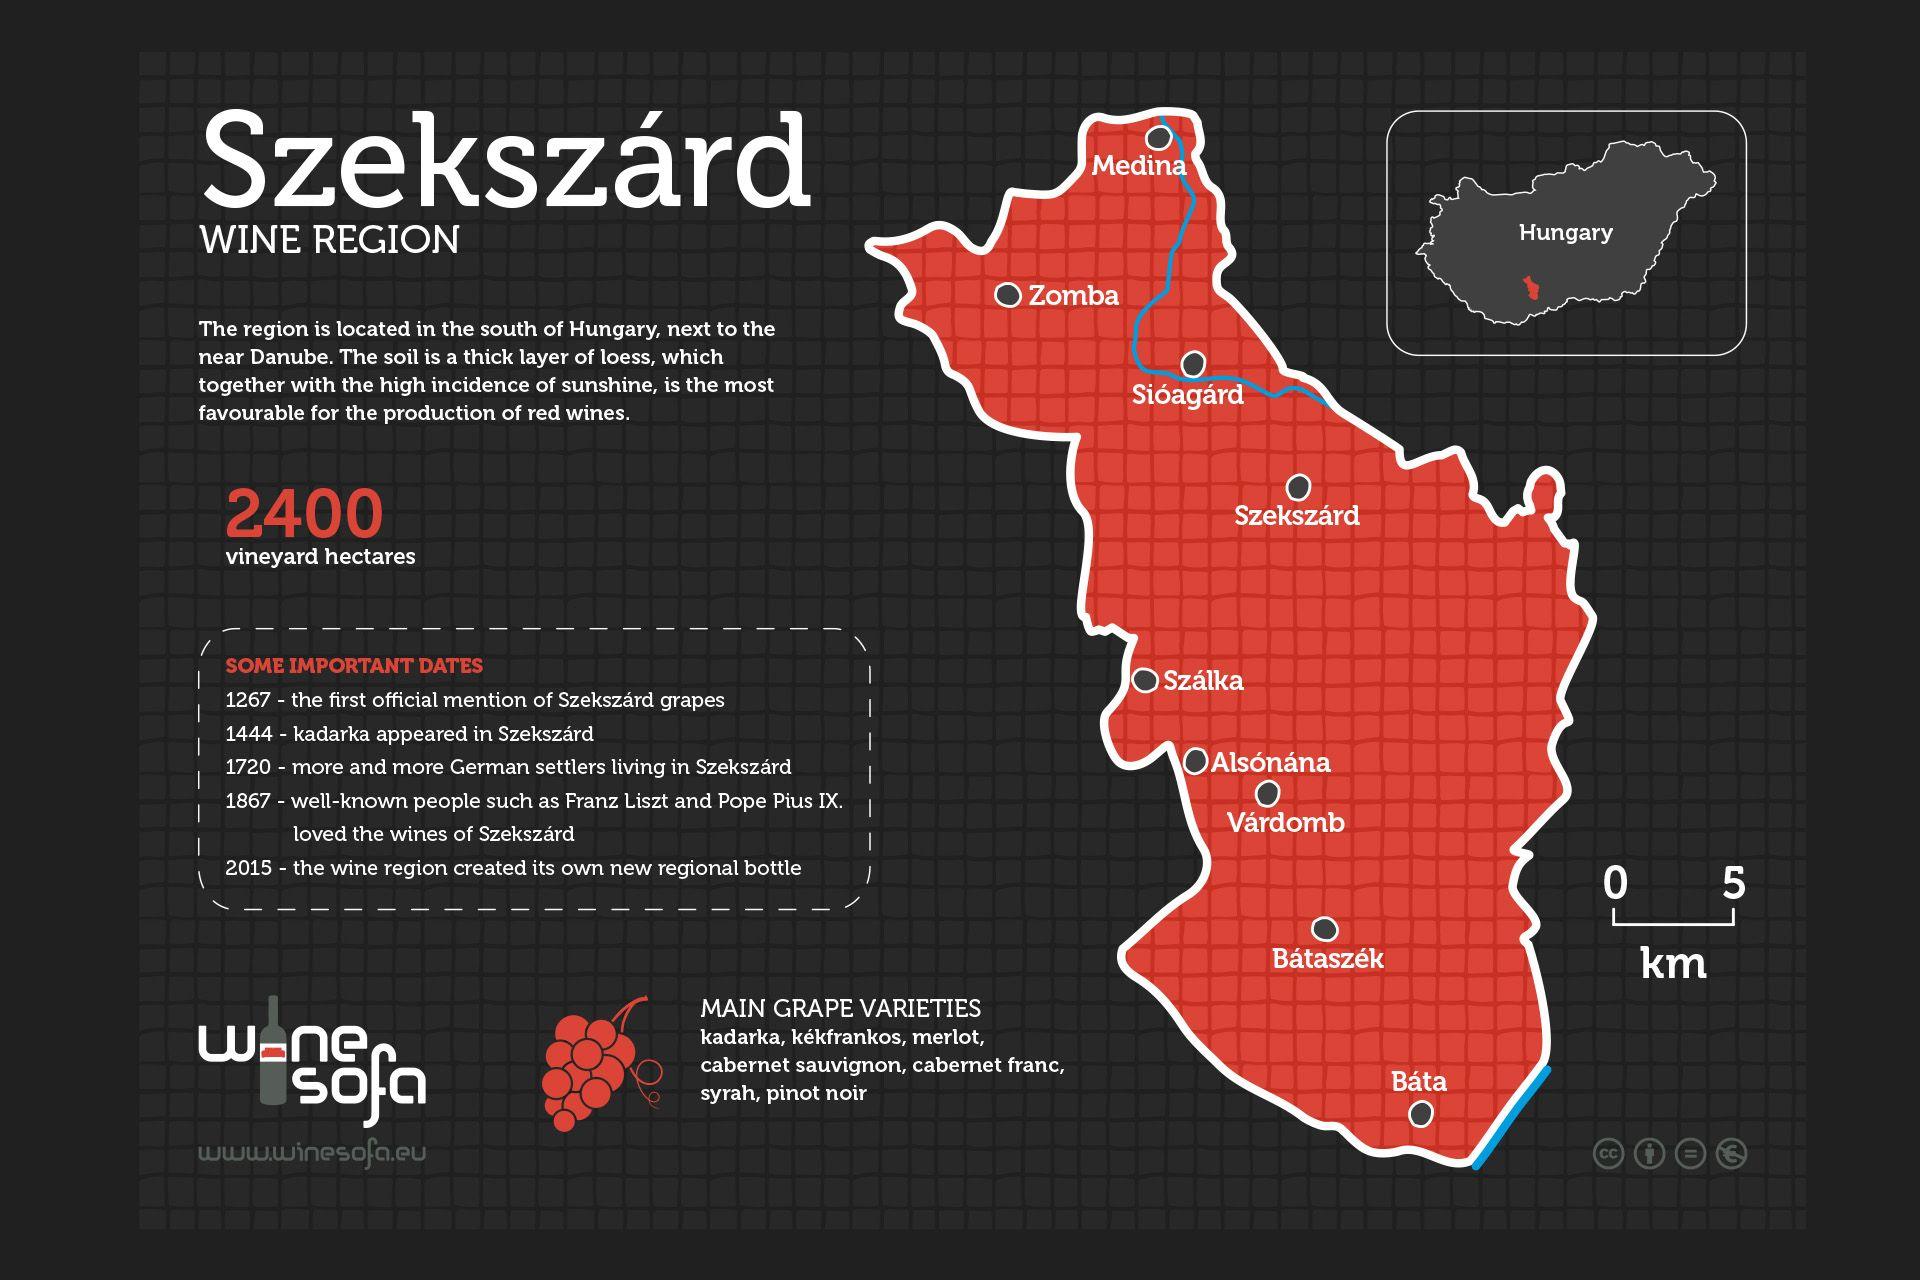 Szekszard Wine Region Infoposter River Cruises In Europe Wine Region European River Cruises